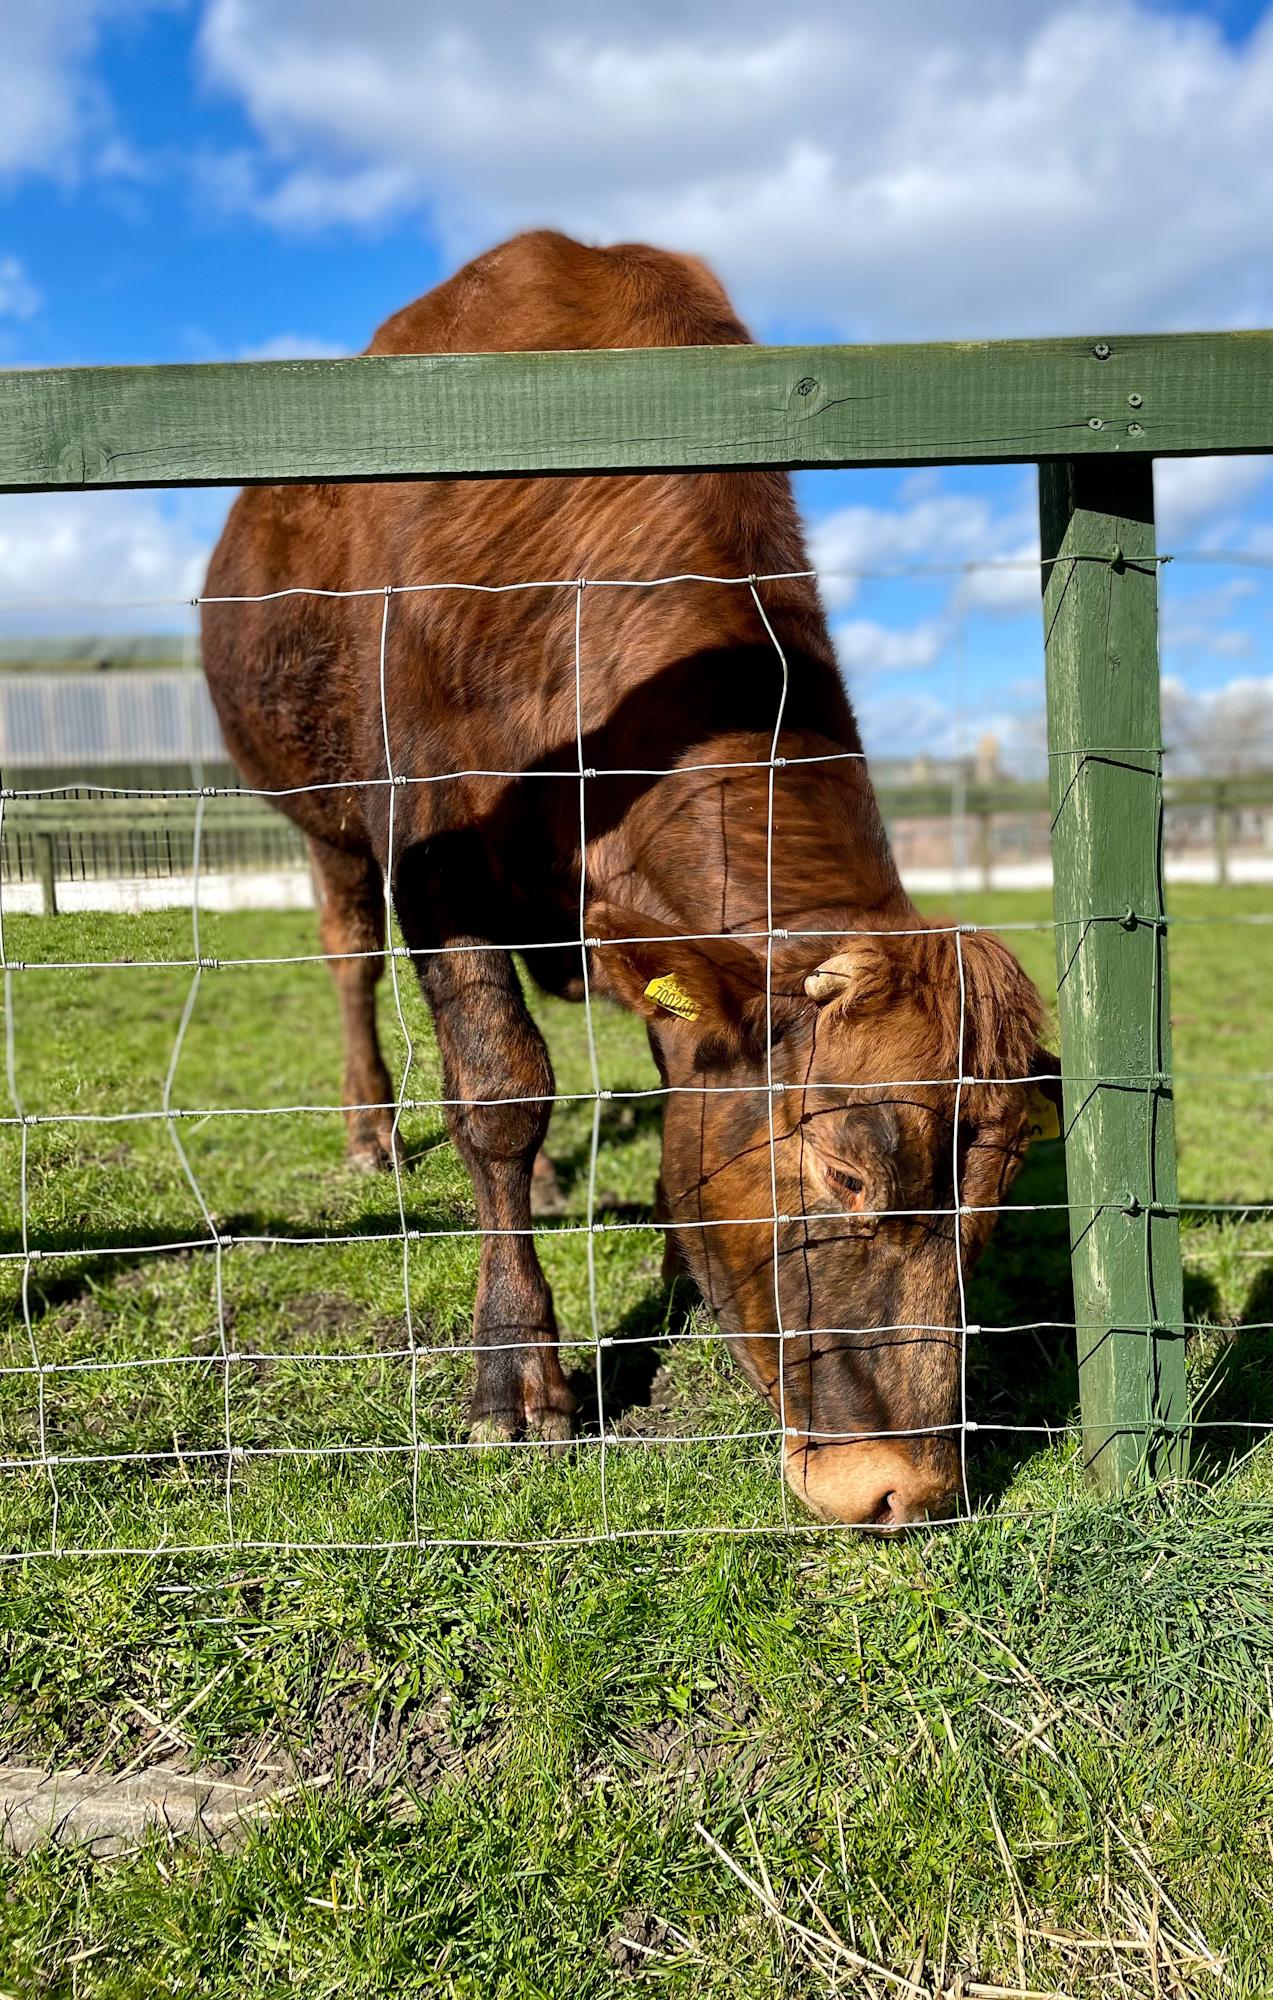 a-cow-at-the-farm